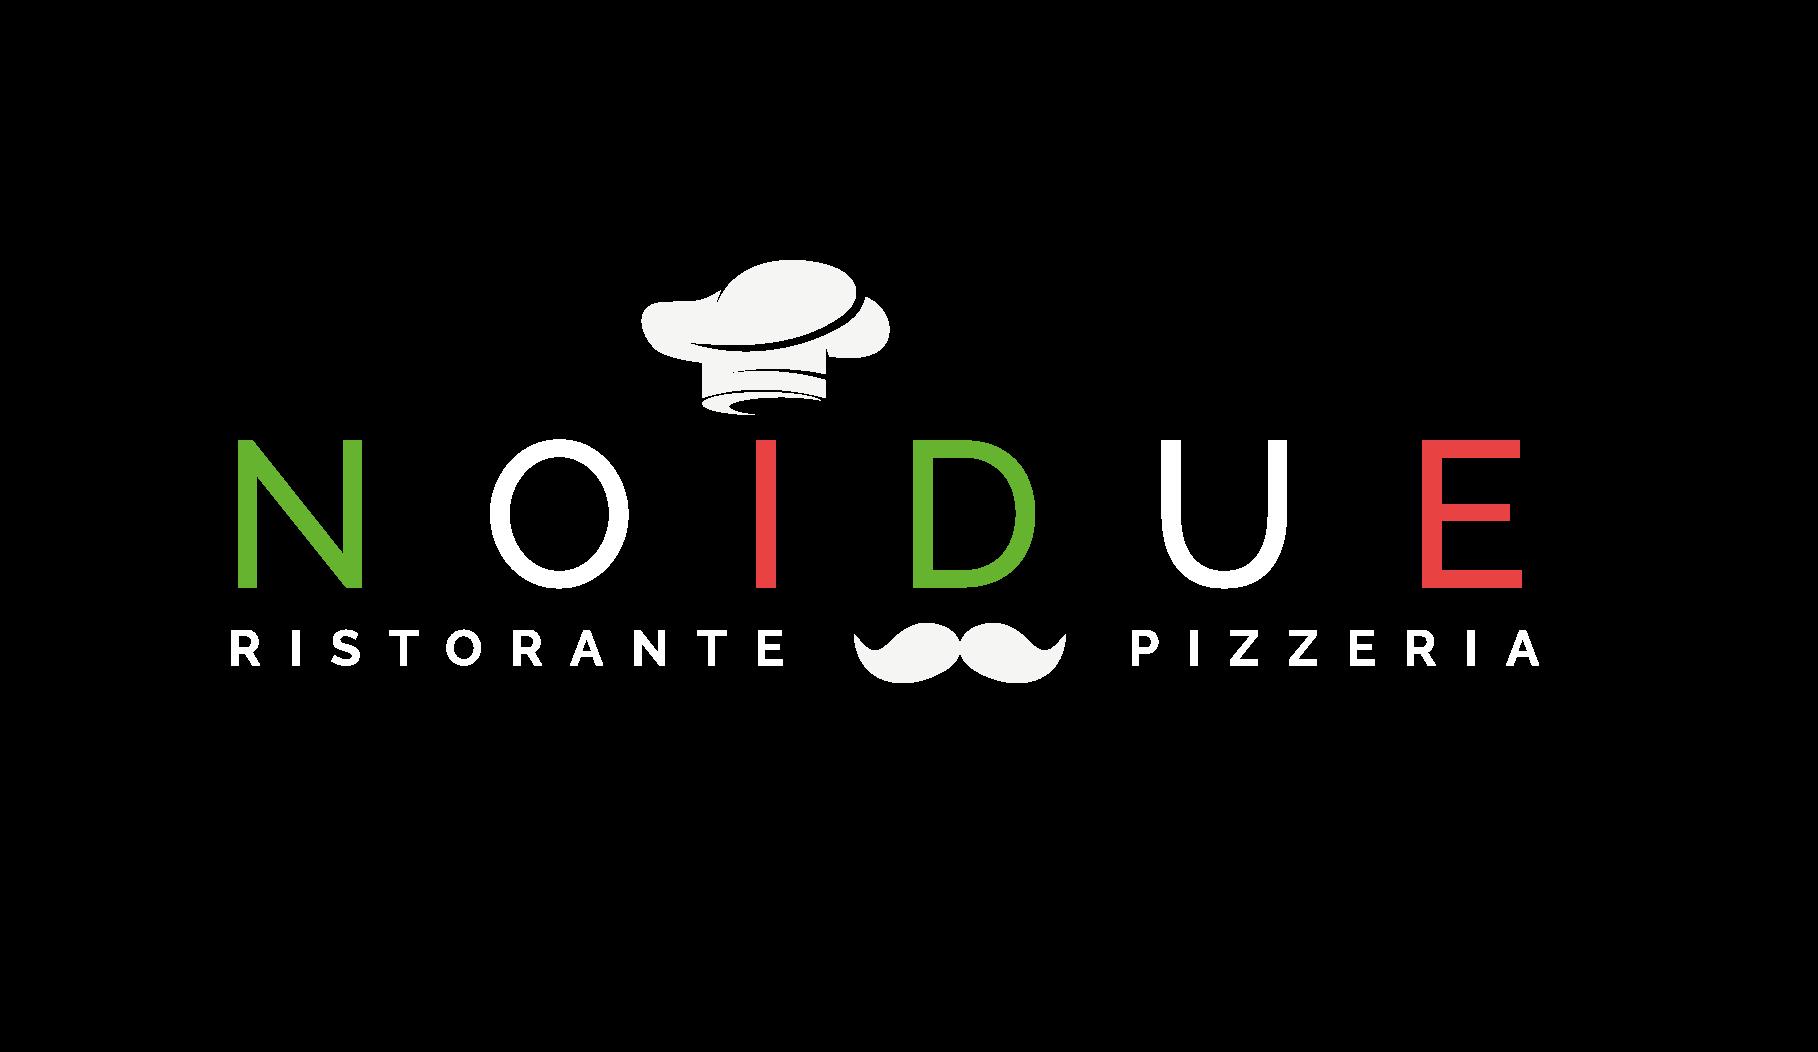 Ristorante Pizzeria Noi Due